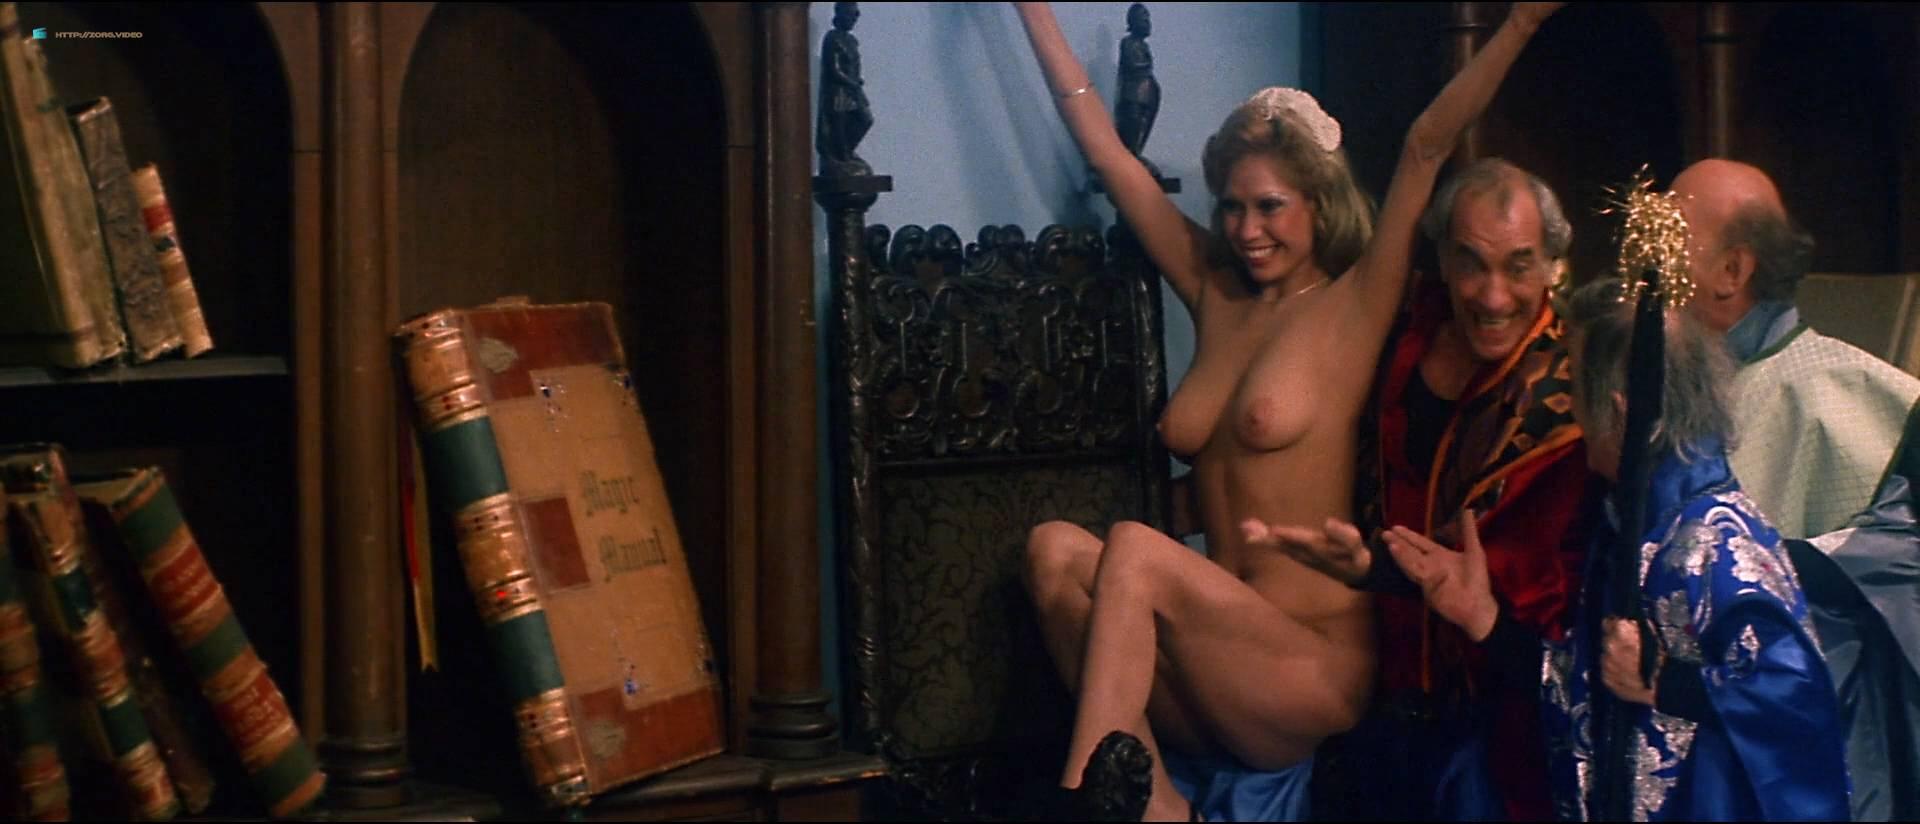 Nude dance show video-7621